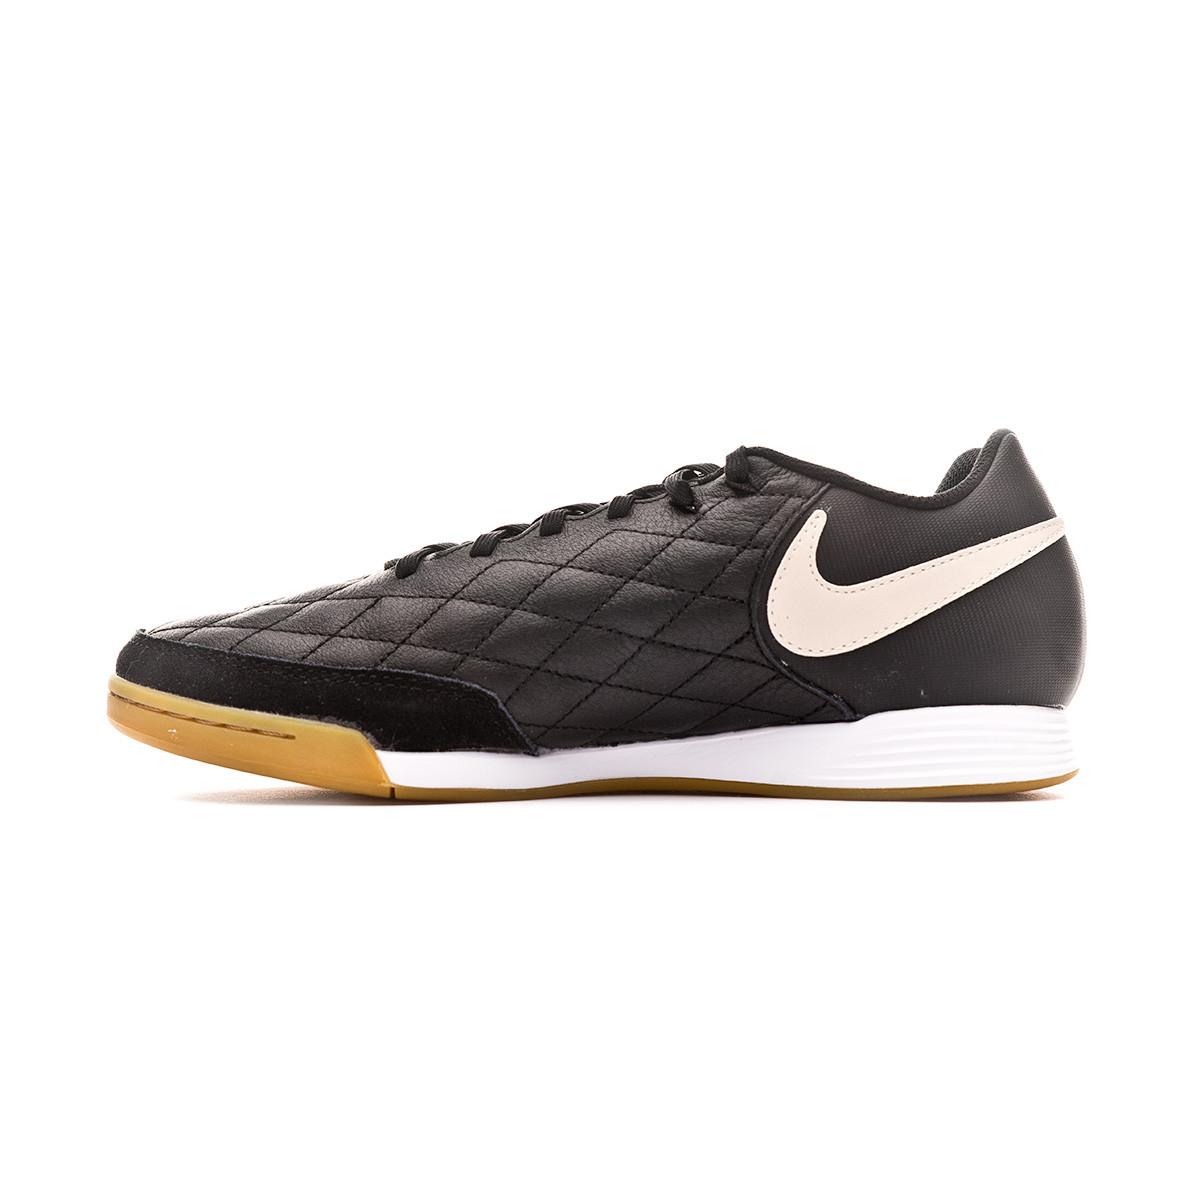 Espectador James Dyson Ajuste  Futsal Boot Nike Tiempo LegendX VII Academy 10R IC Black-Light  orewood-Metallic gold - Football store Fútbol Emotion